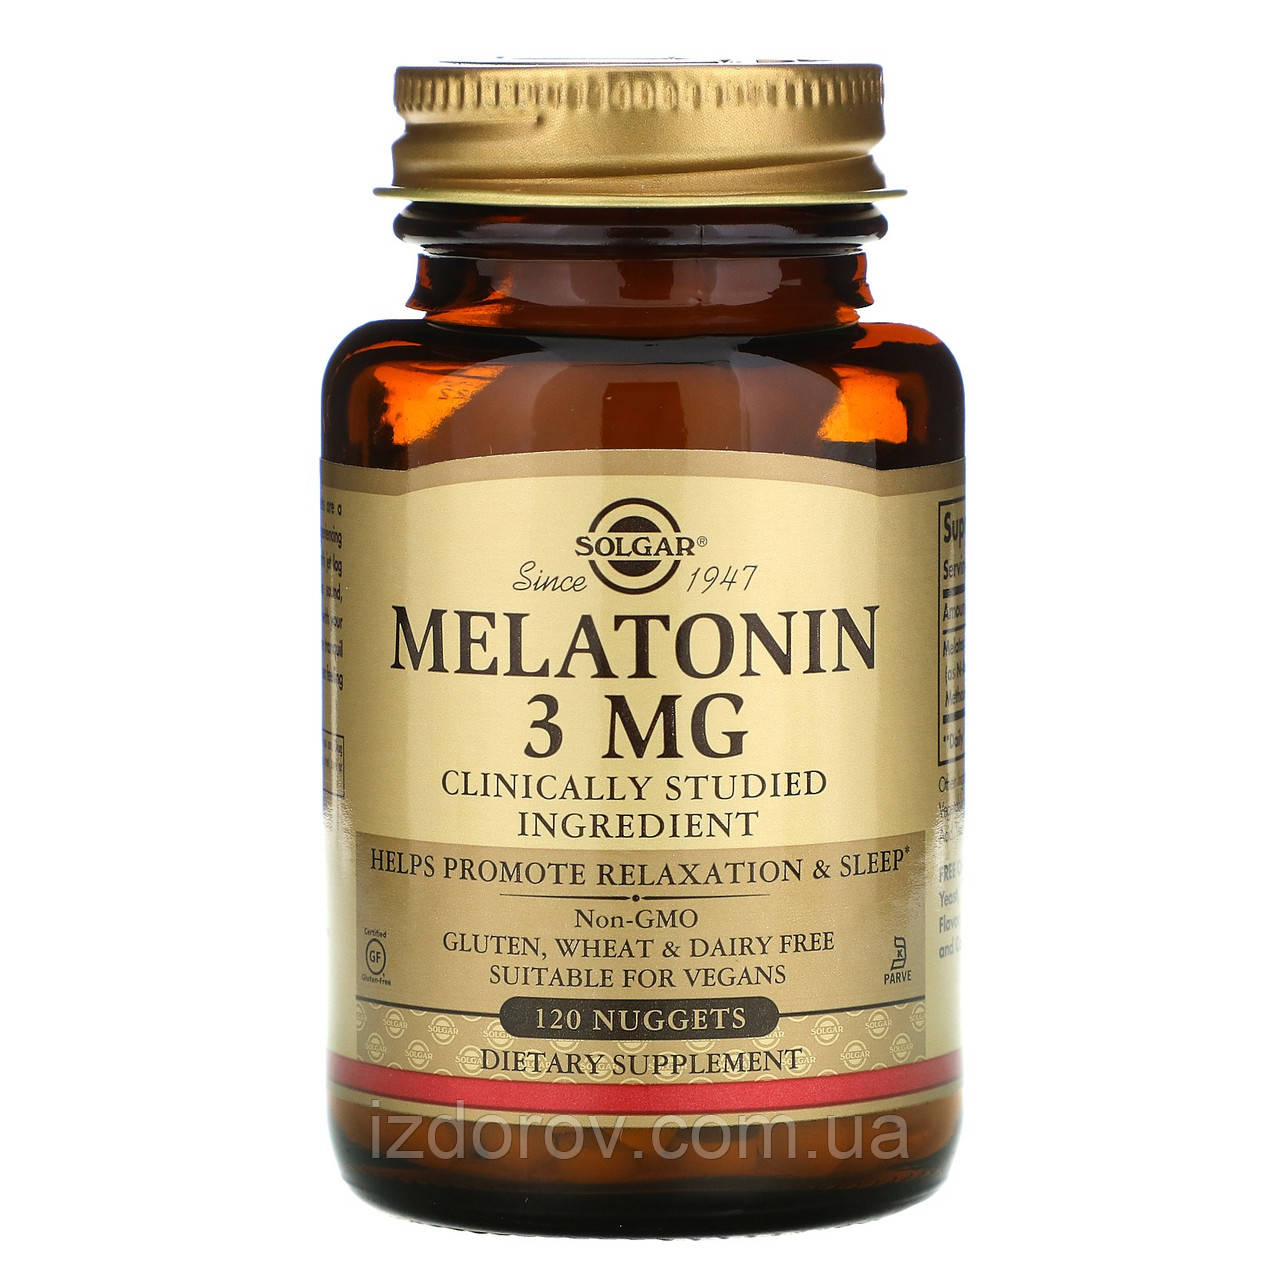 Solgar, Мелатонин, 3 мг, 120 пастилок